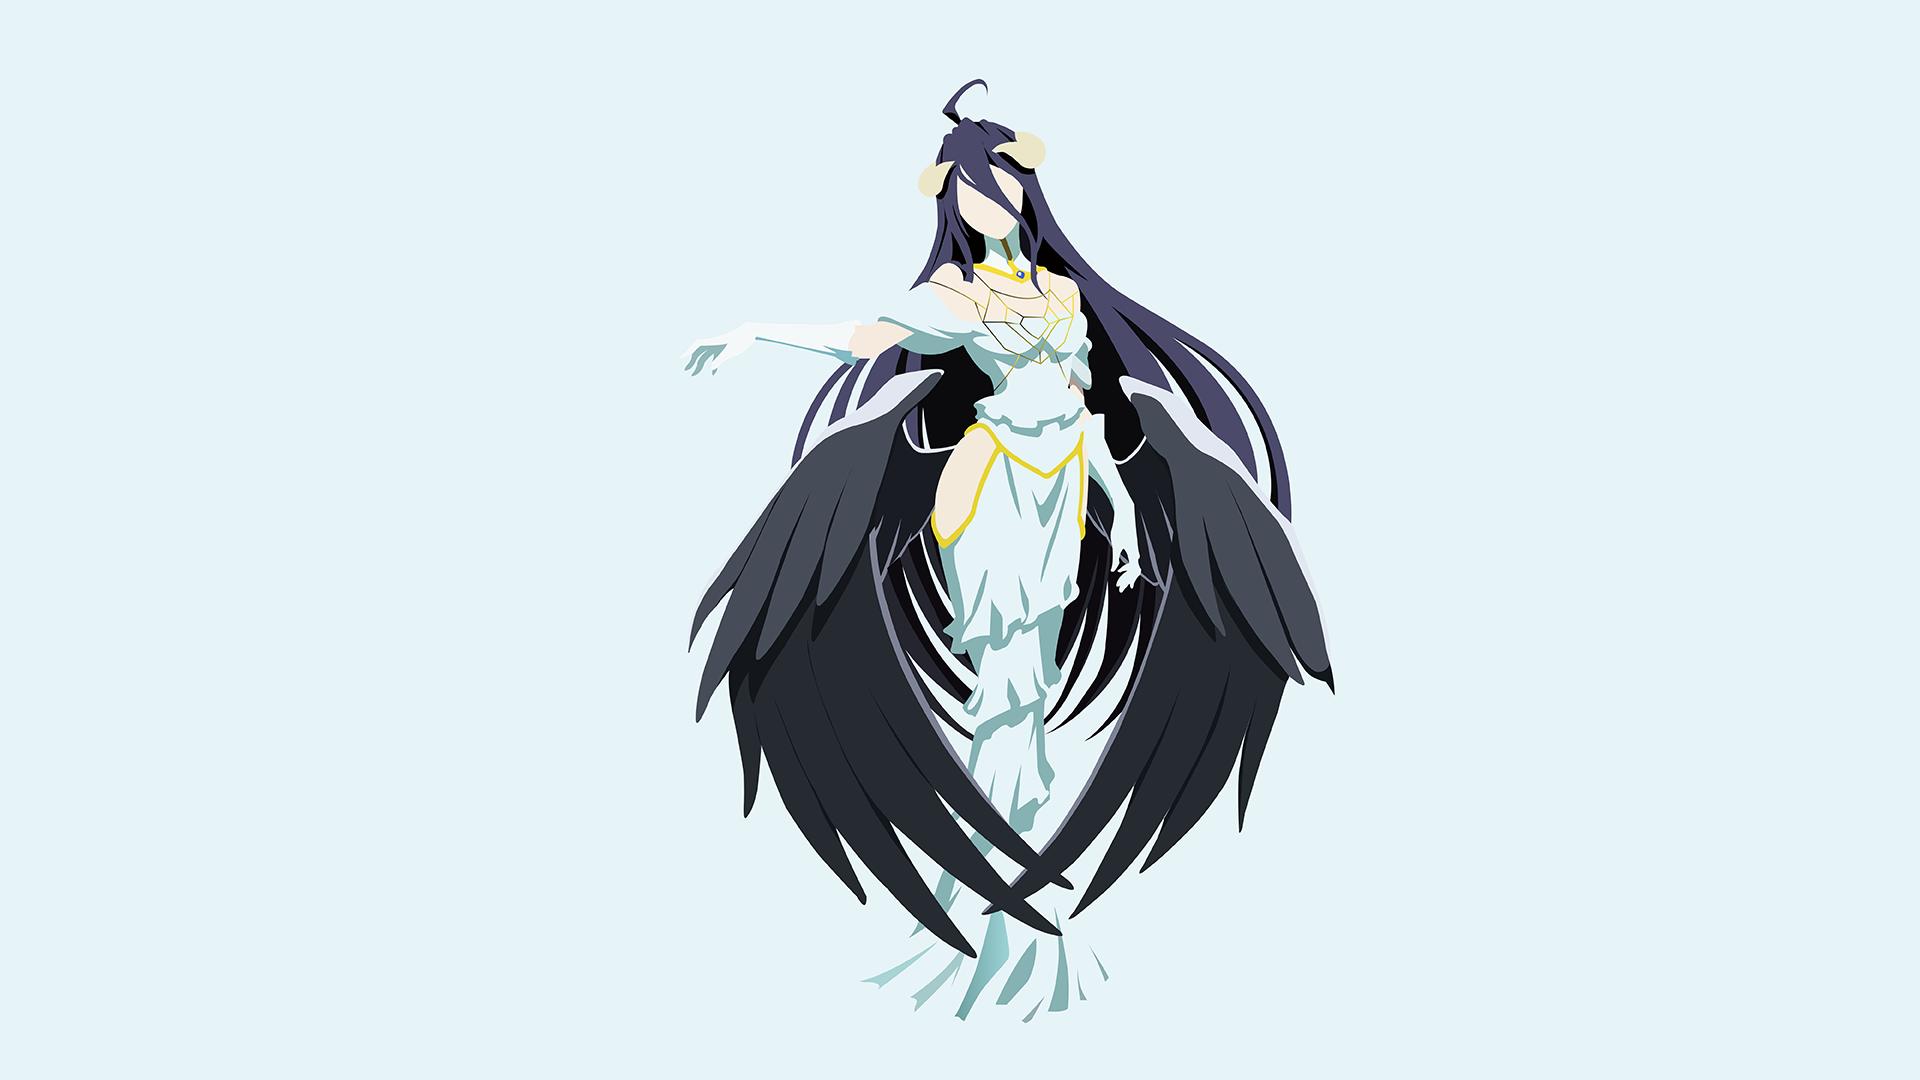 Illustration anime girls bird of prey eagle overlord anime albedo overlord bird macaw wing perching bird